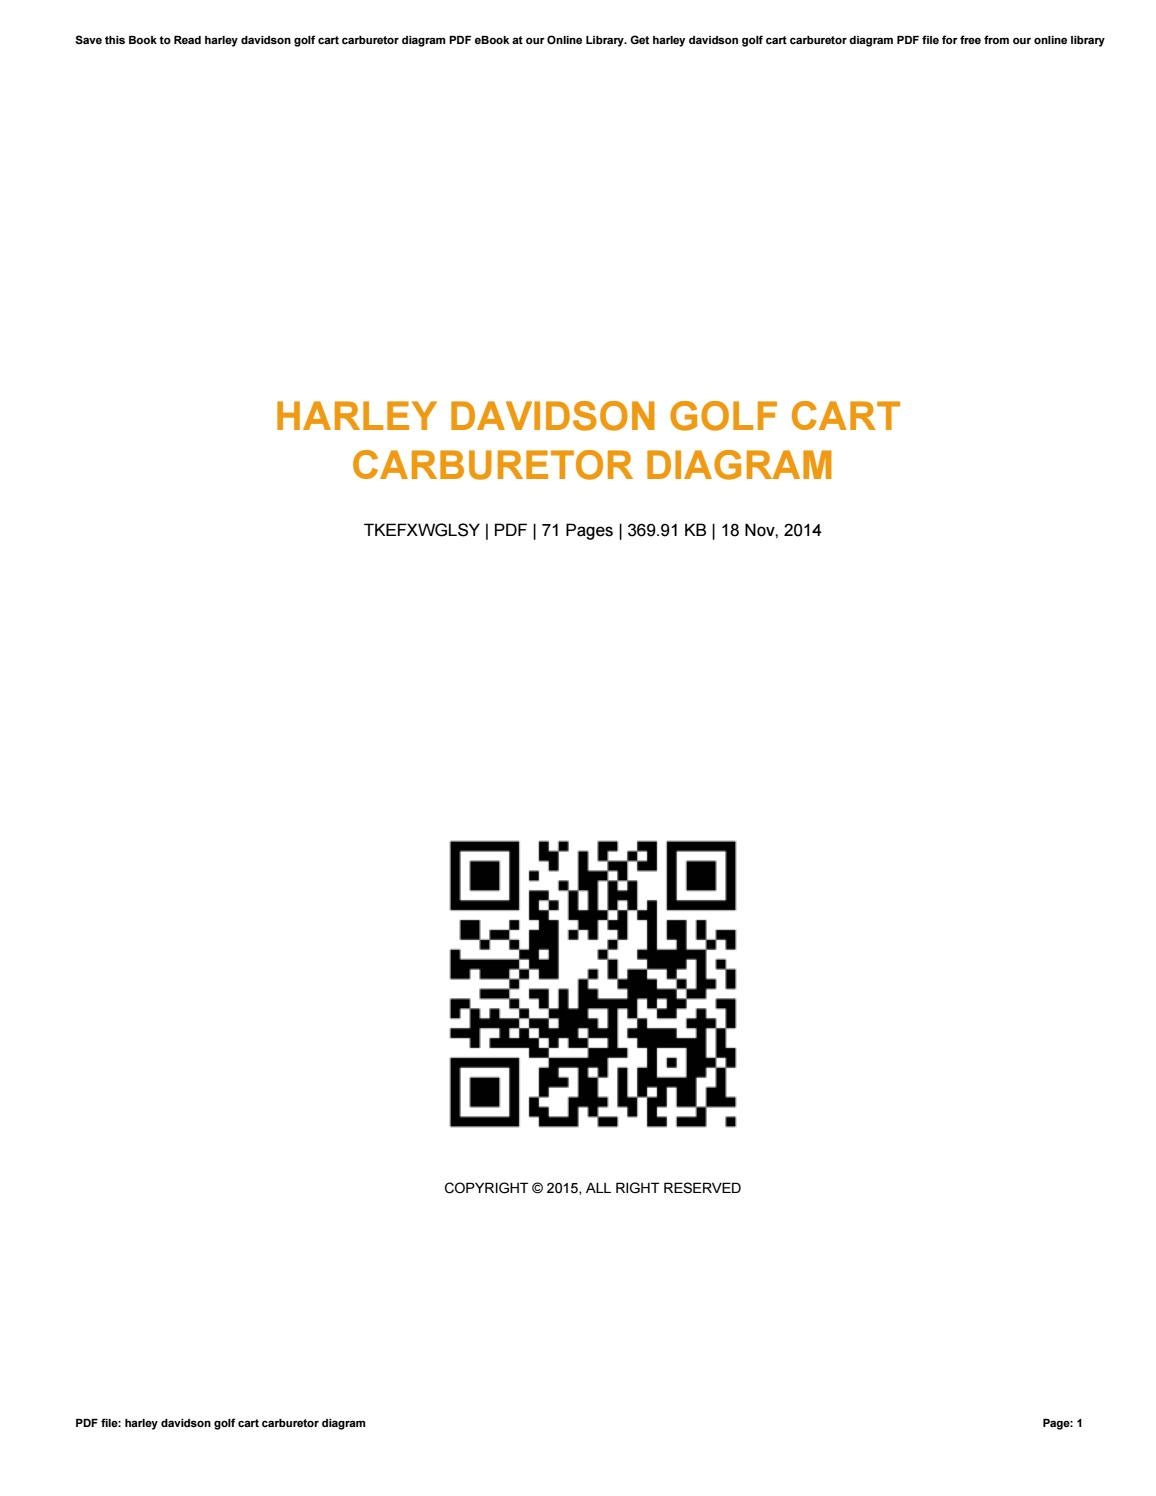 Harley davidson golf cart carburetor diagram by janerabon1296 issuu ccuart Image collections